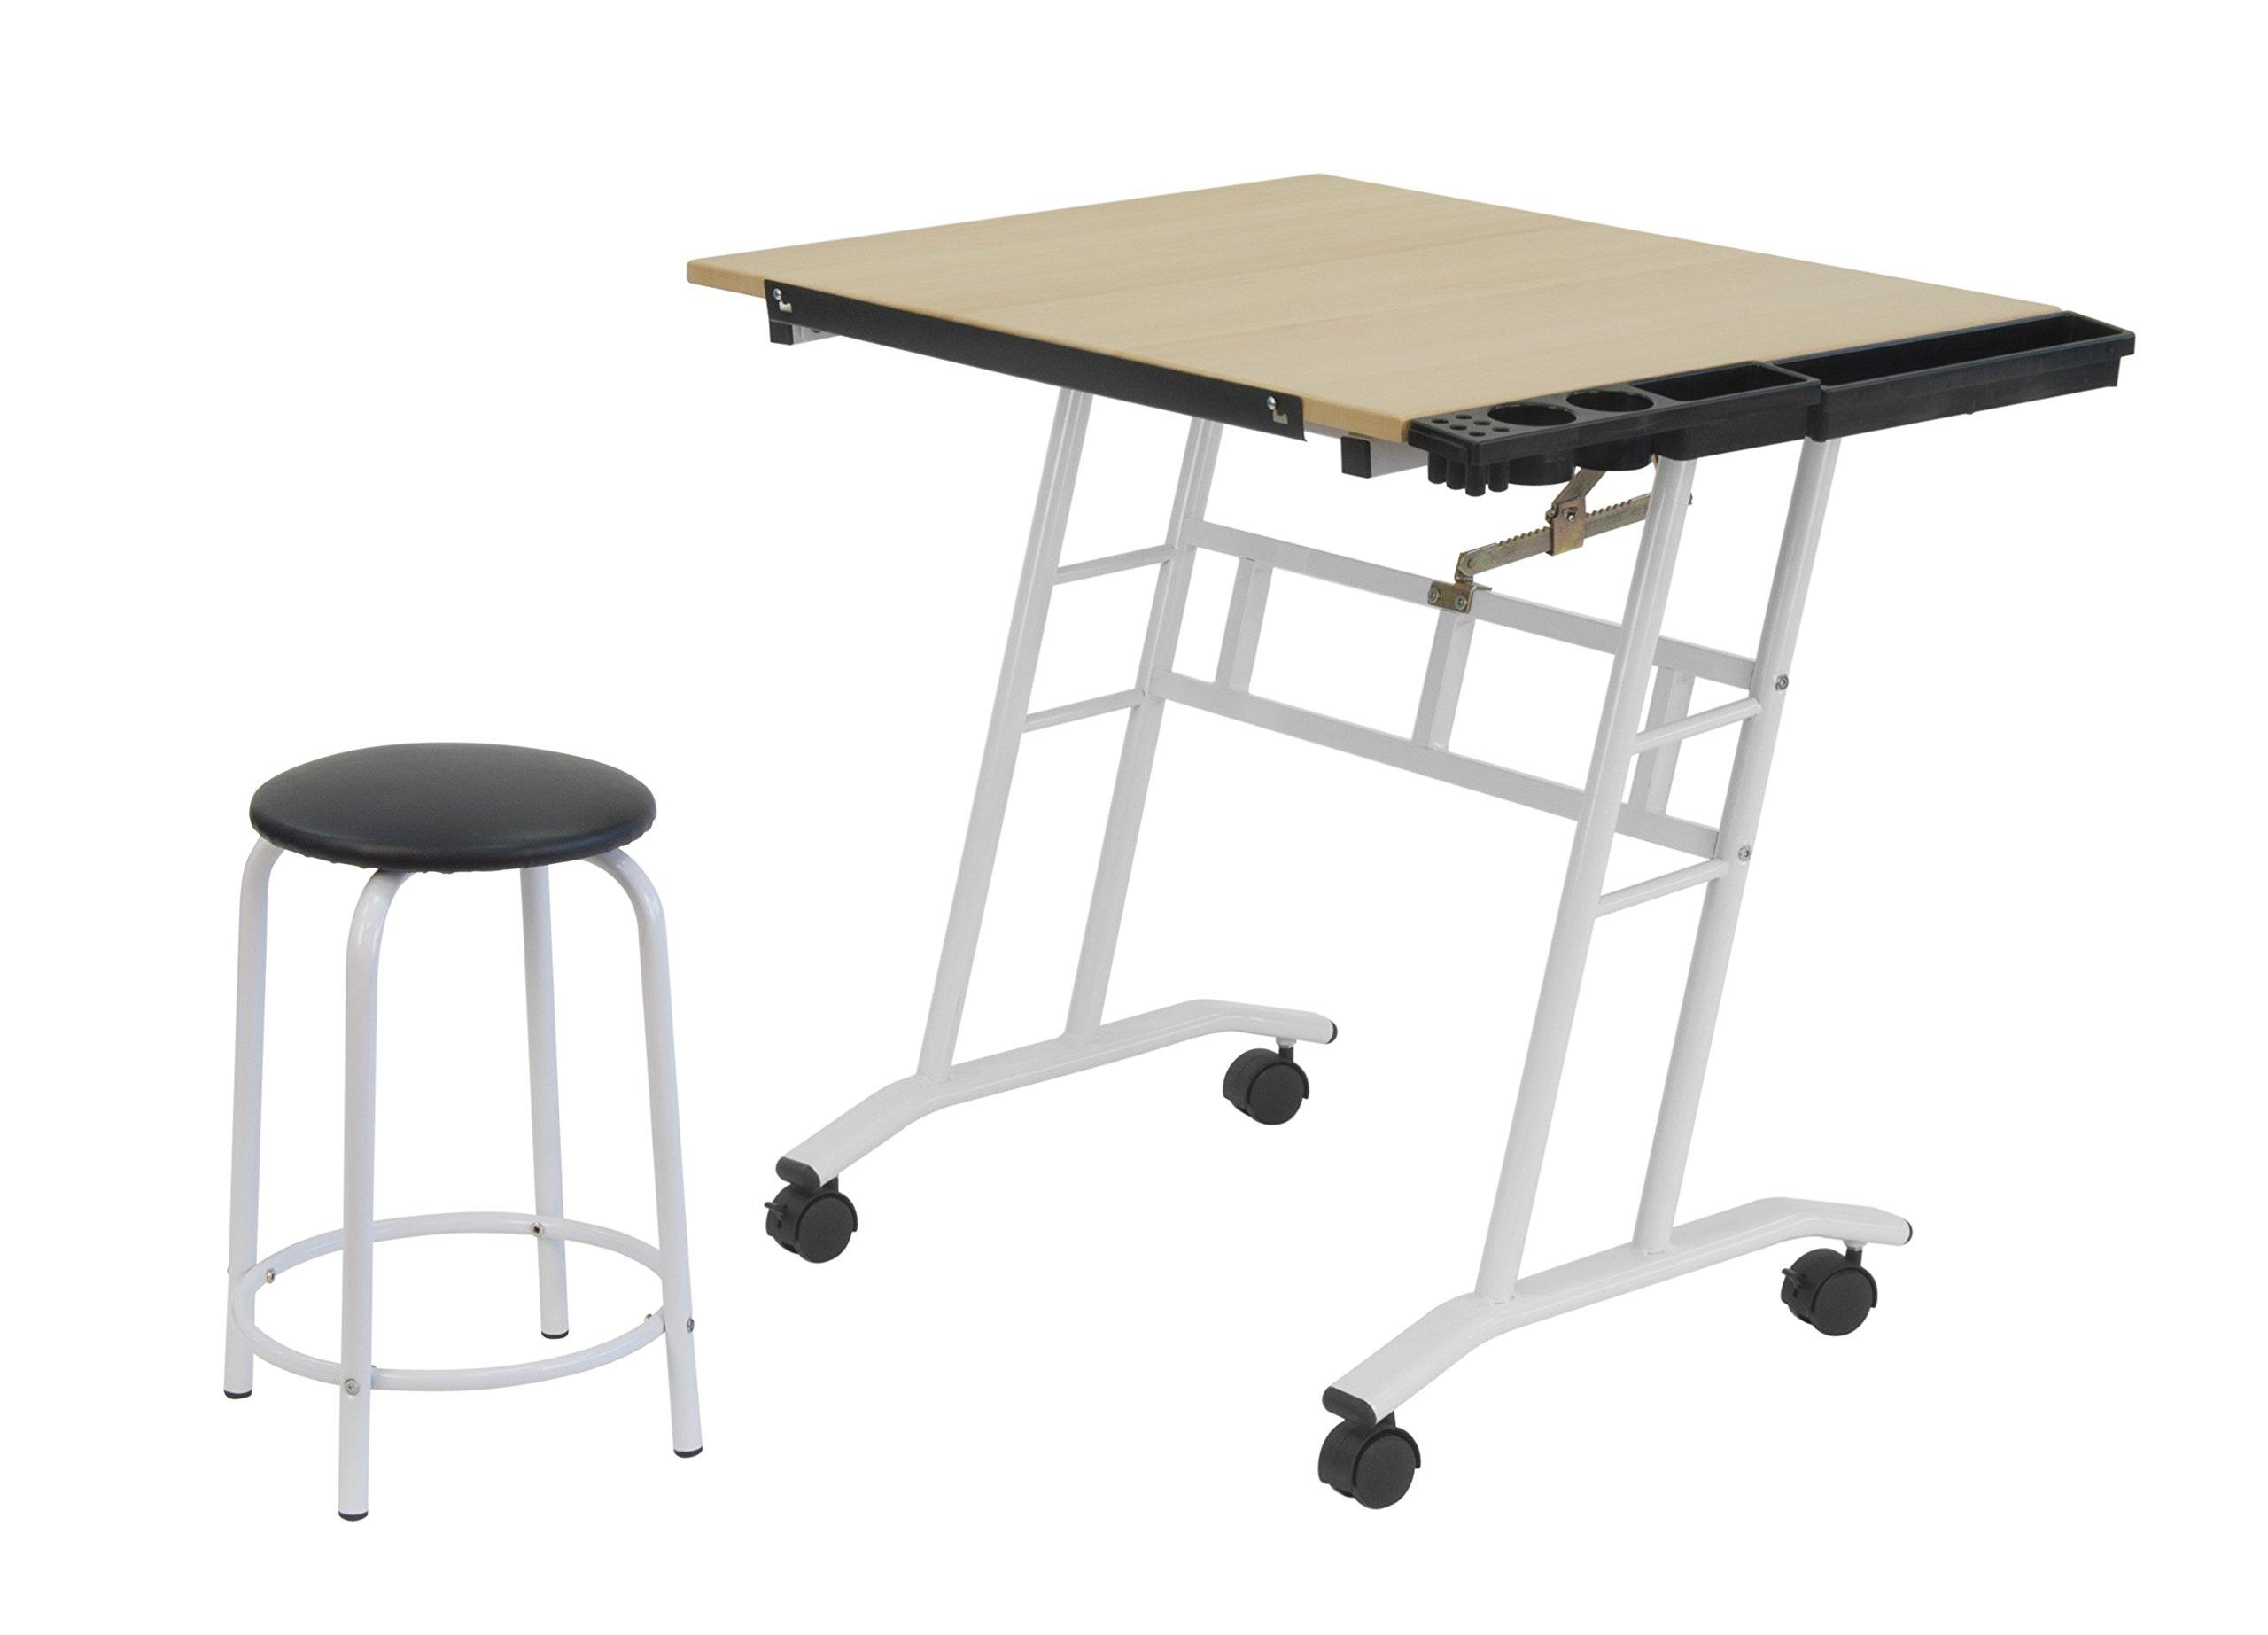 Studio Designs 13240 Craft Center, White/Maple by SD STUDIO DESIGNS